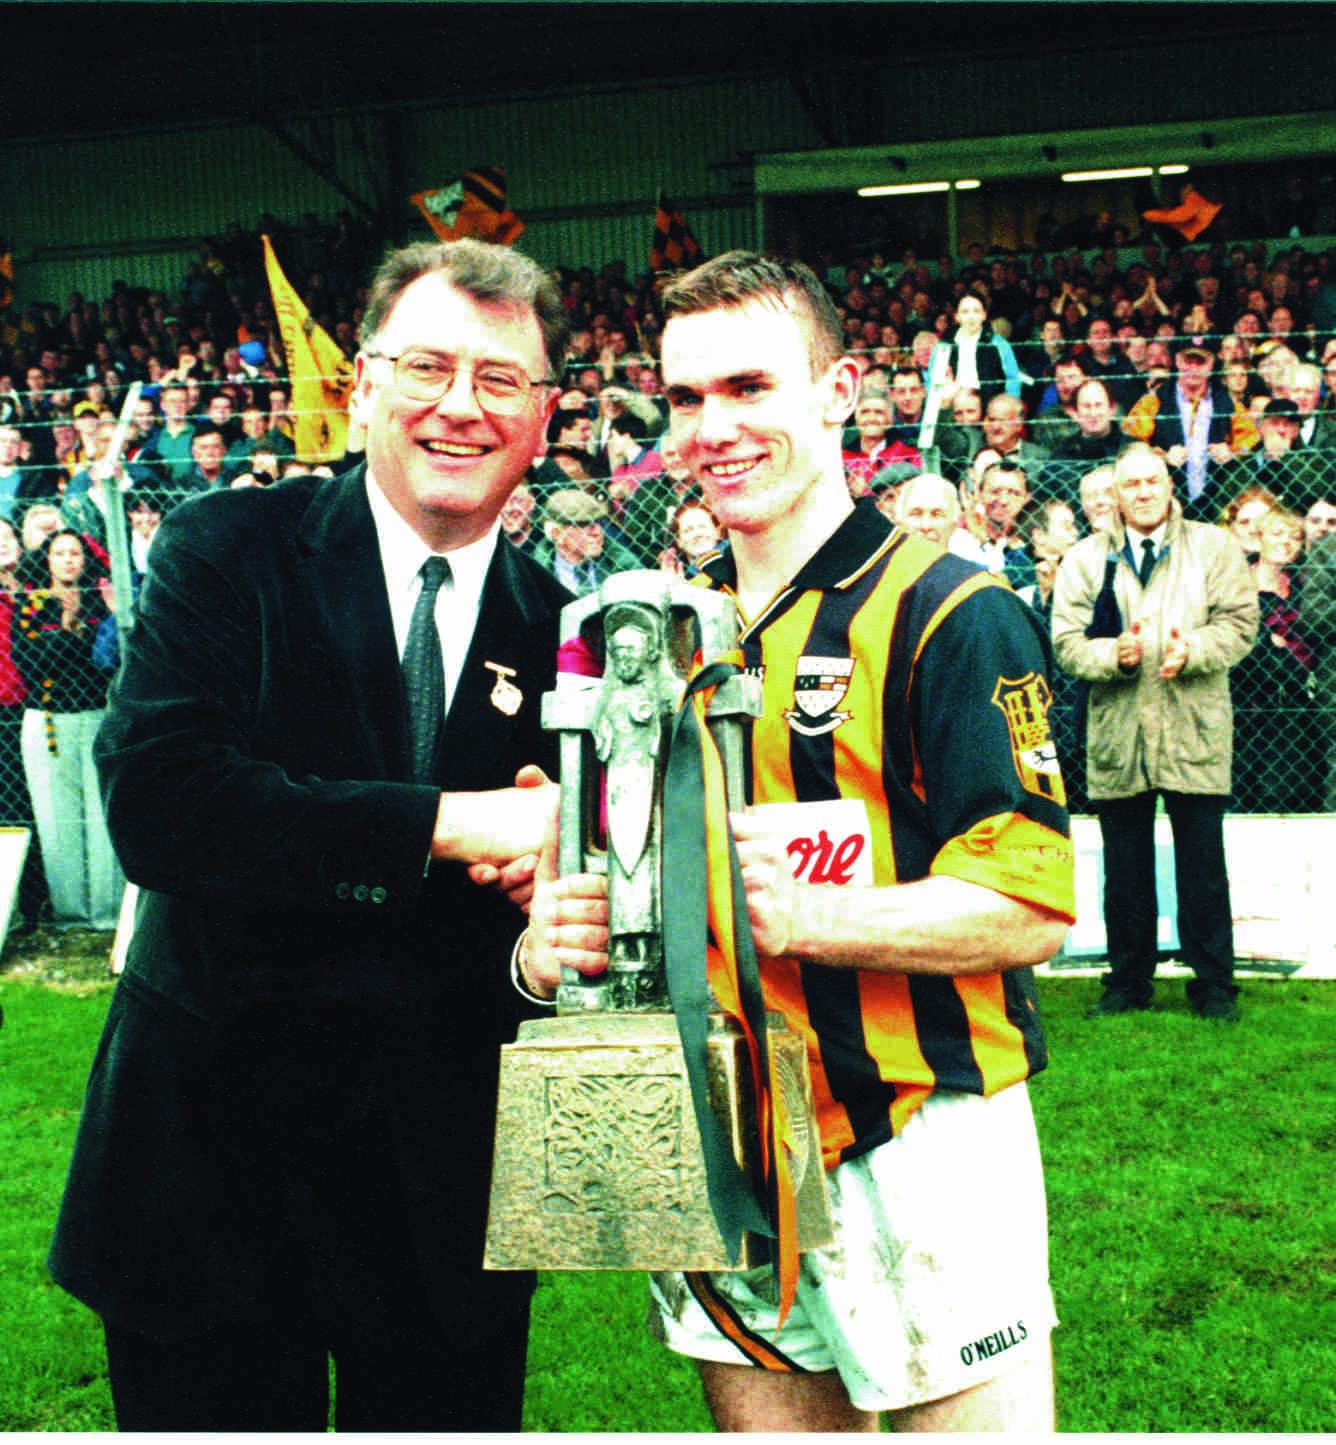 Noel Hickey receives the U21 Trophy from Uachtaran Joe McDonagh